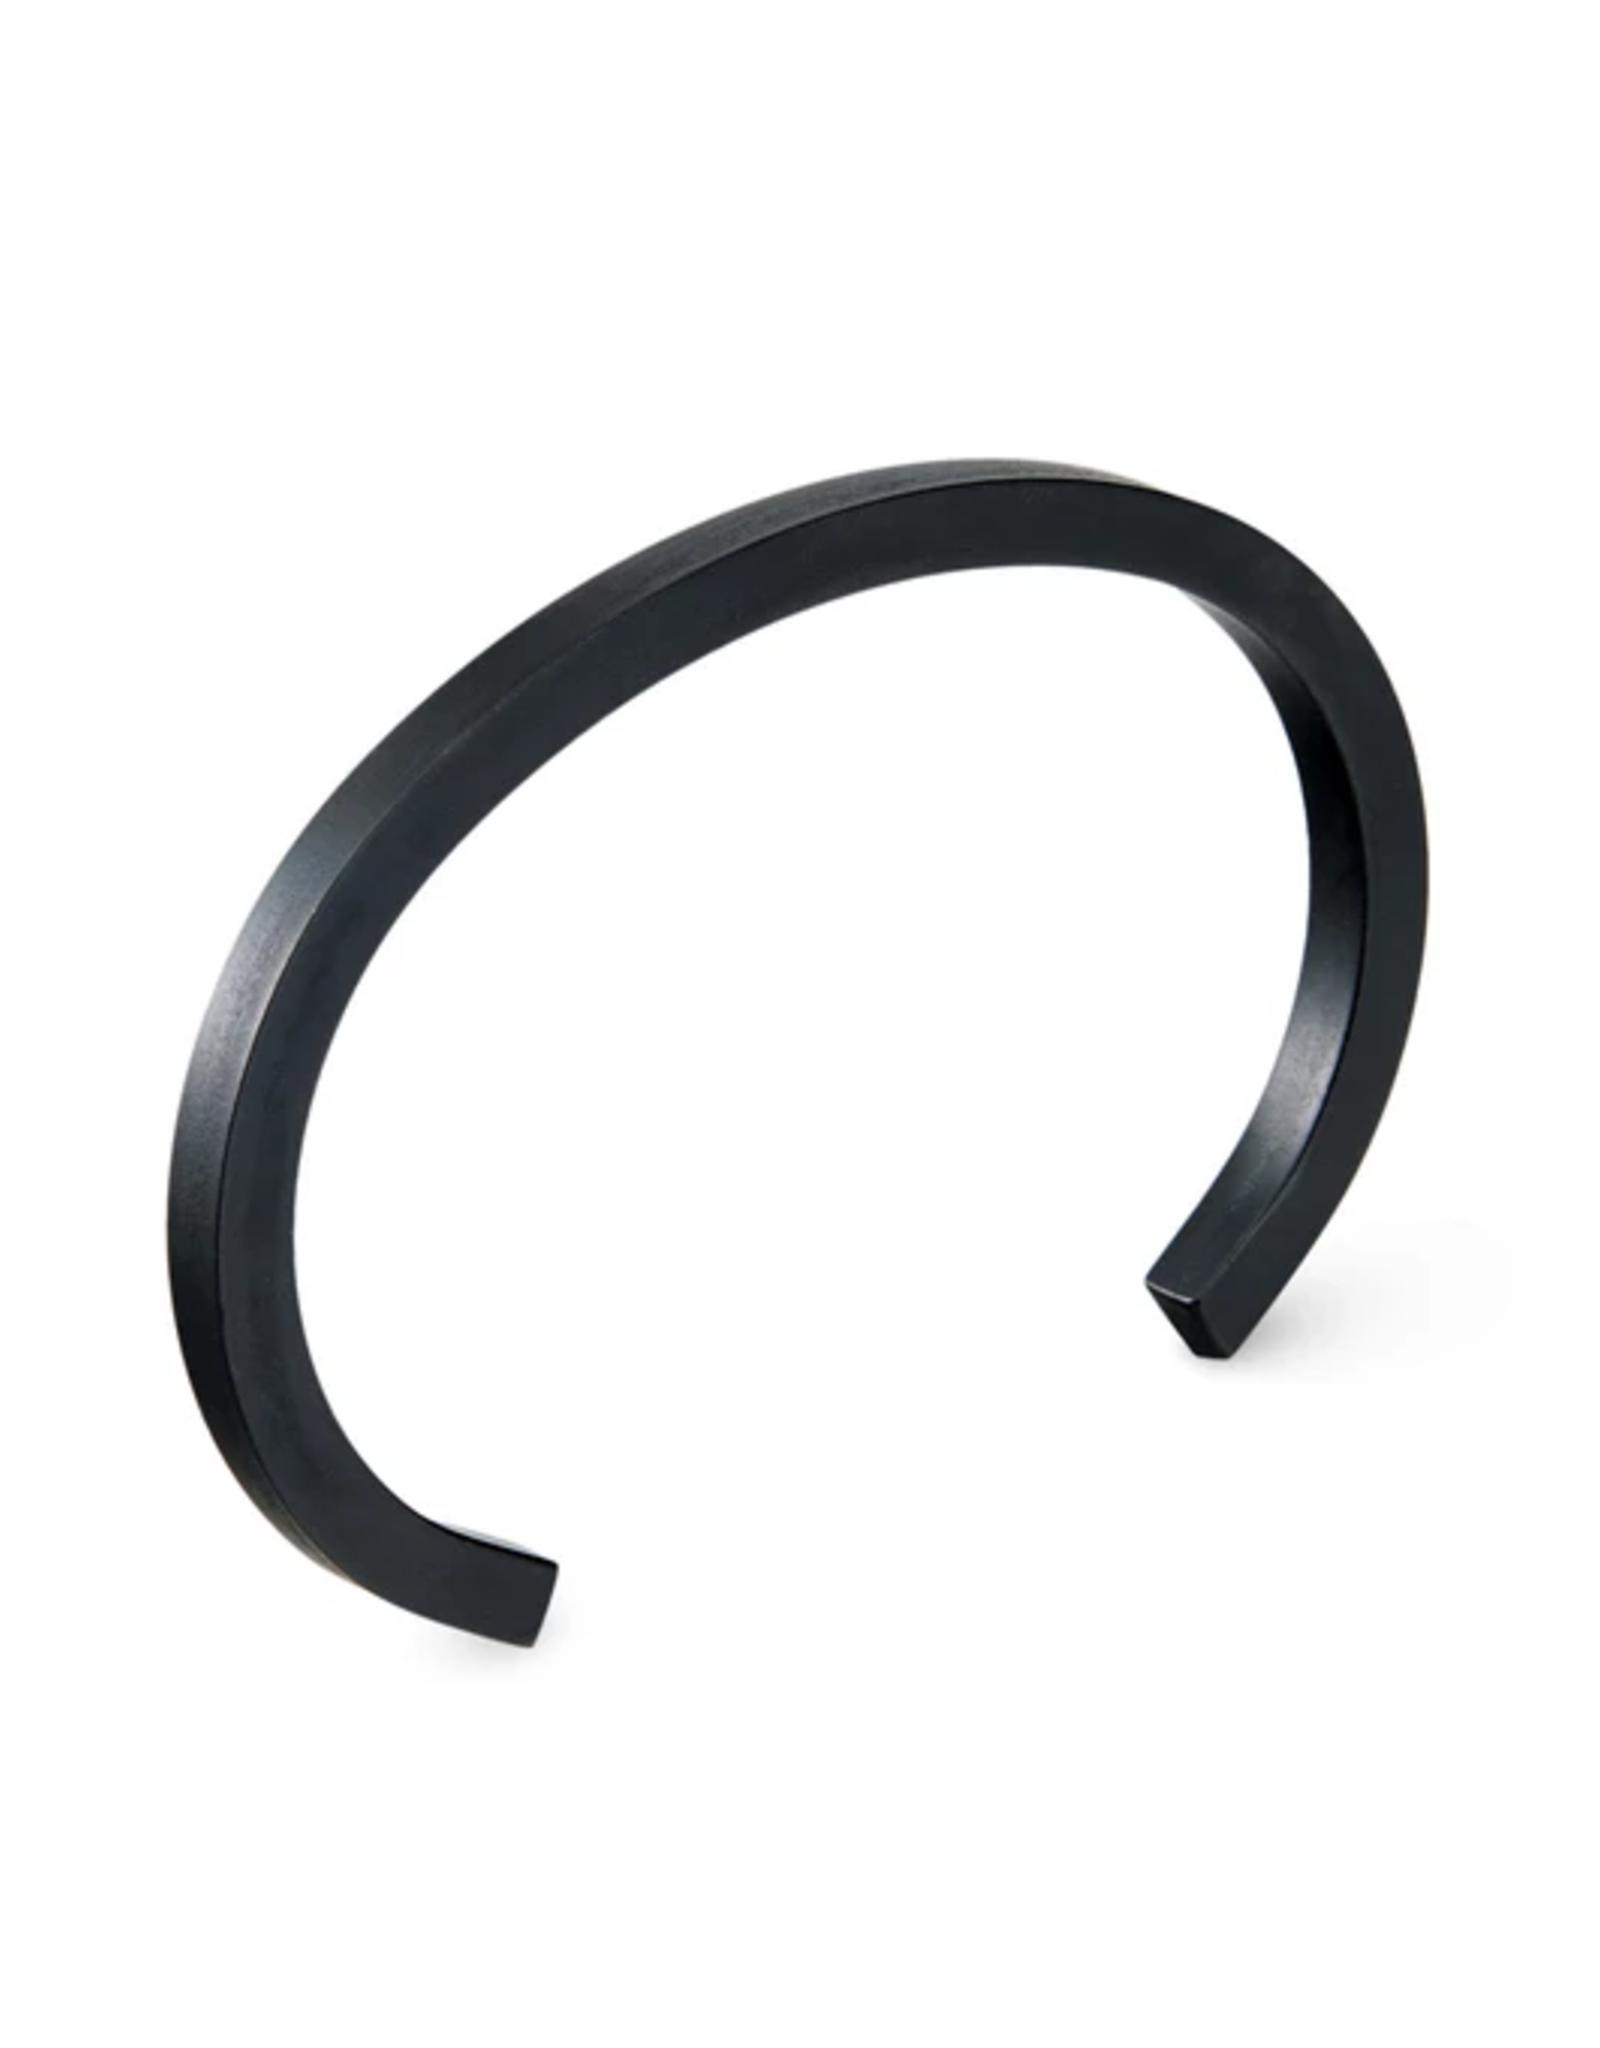 Craighill Uniform Square Cuff - Carbon Black